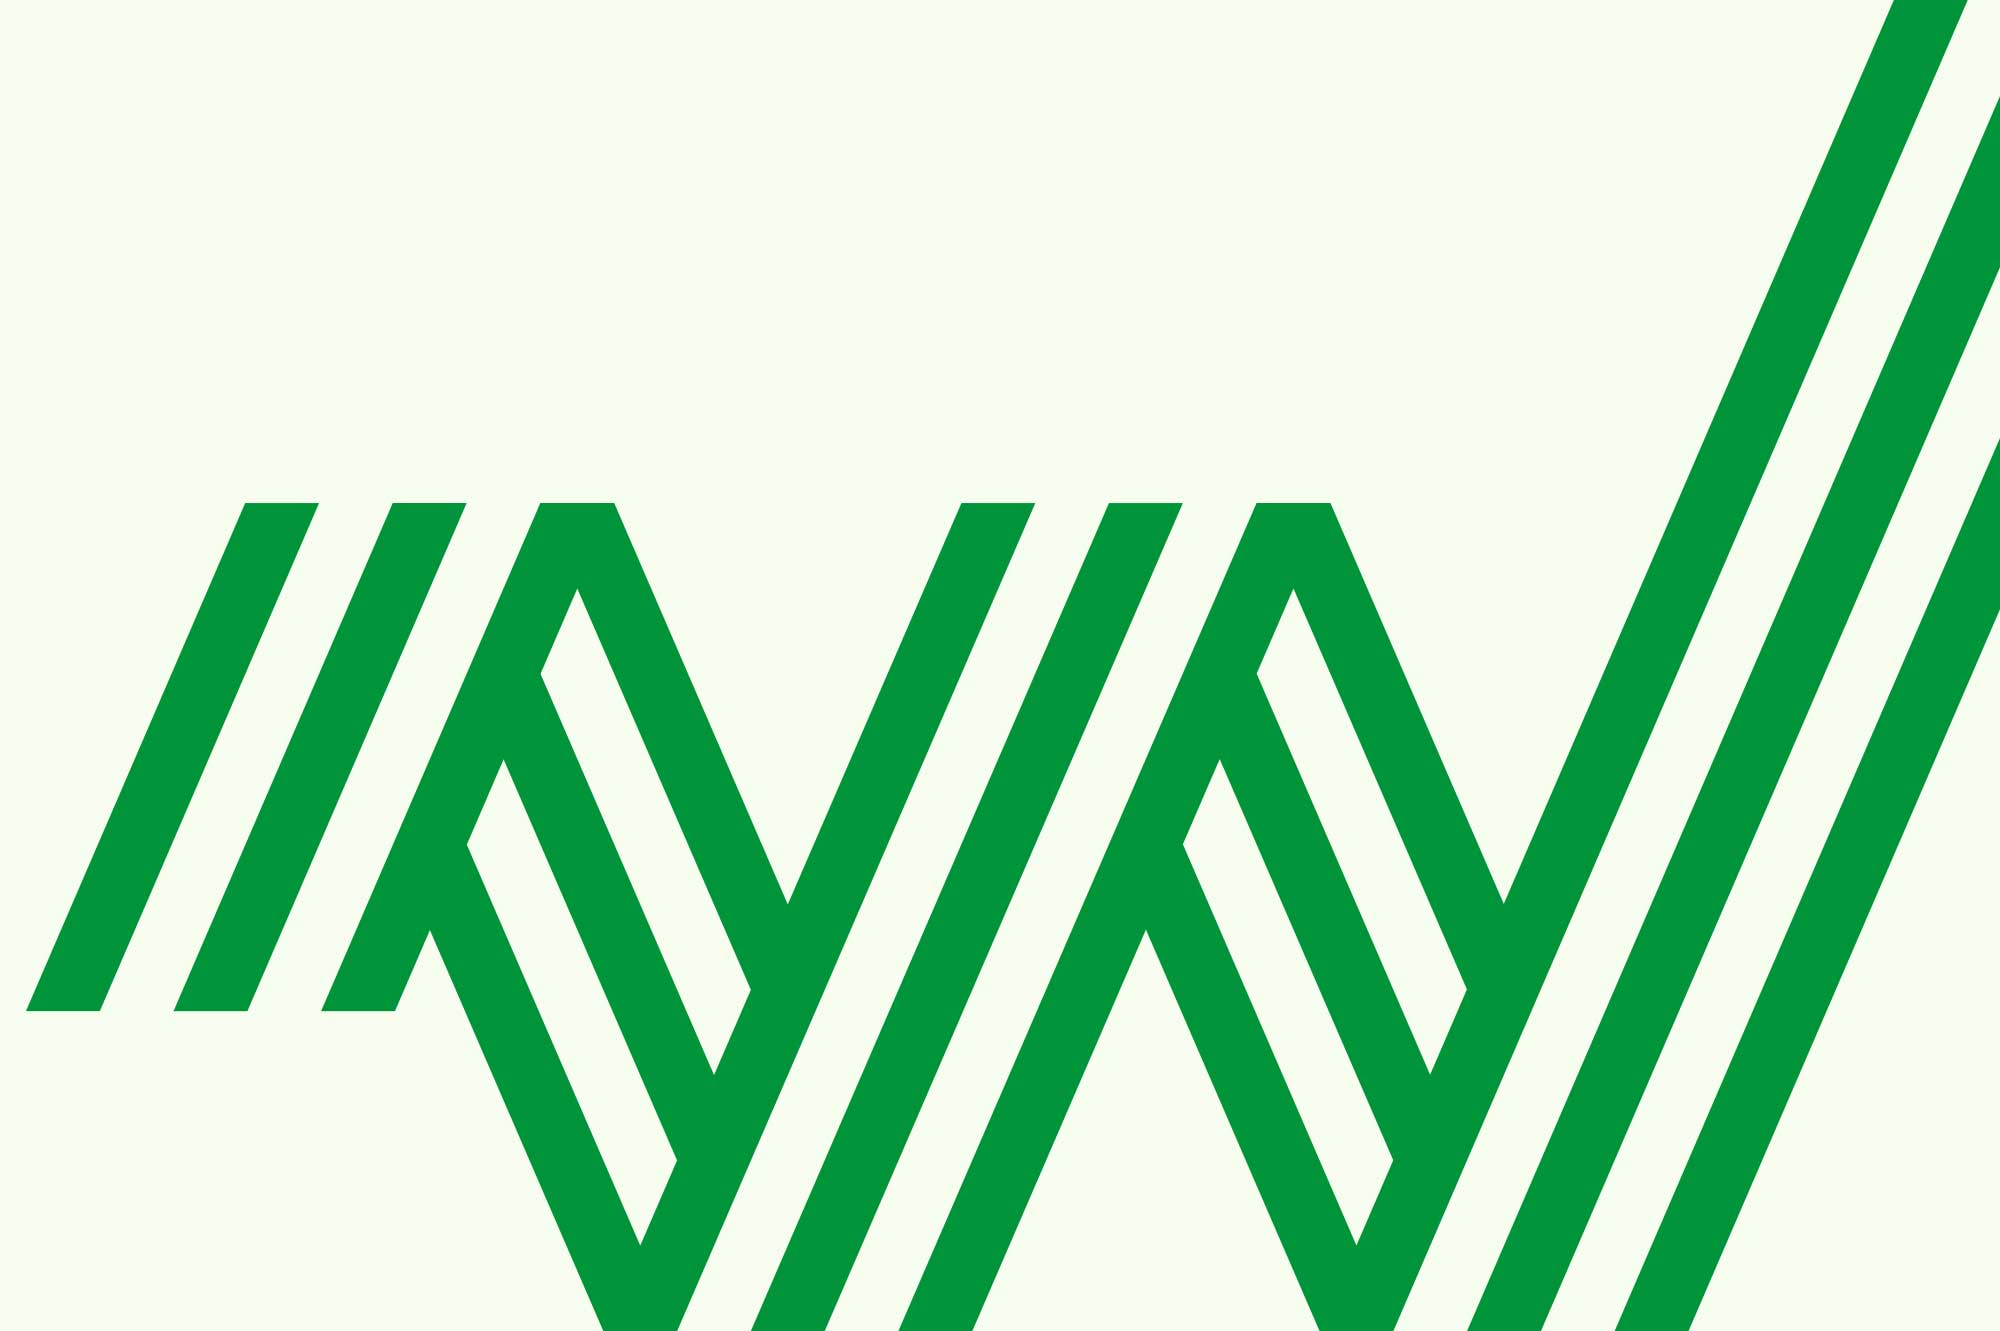 Wastecheck W Graphic